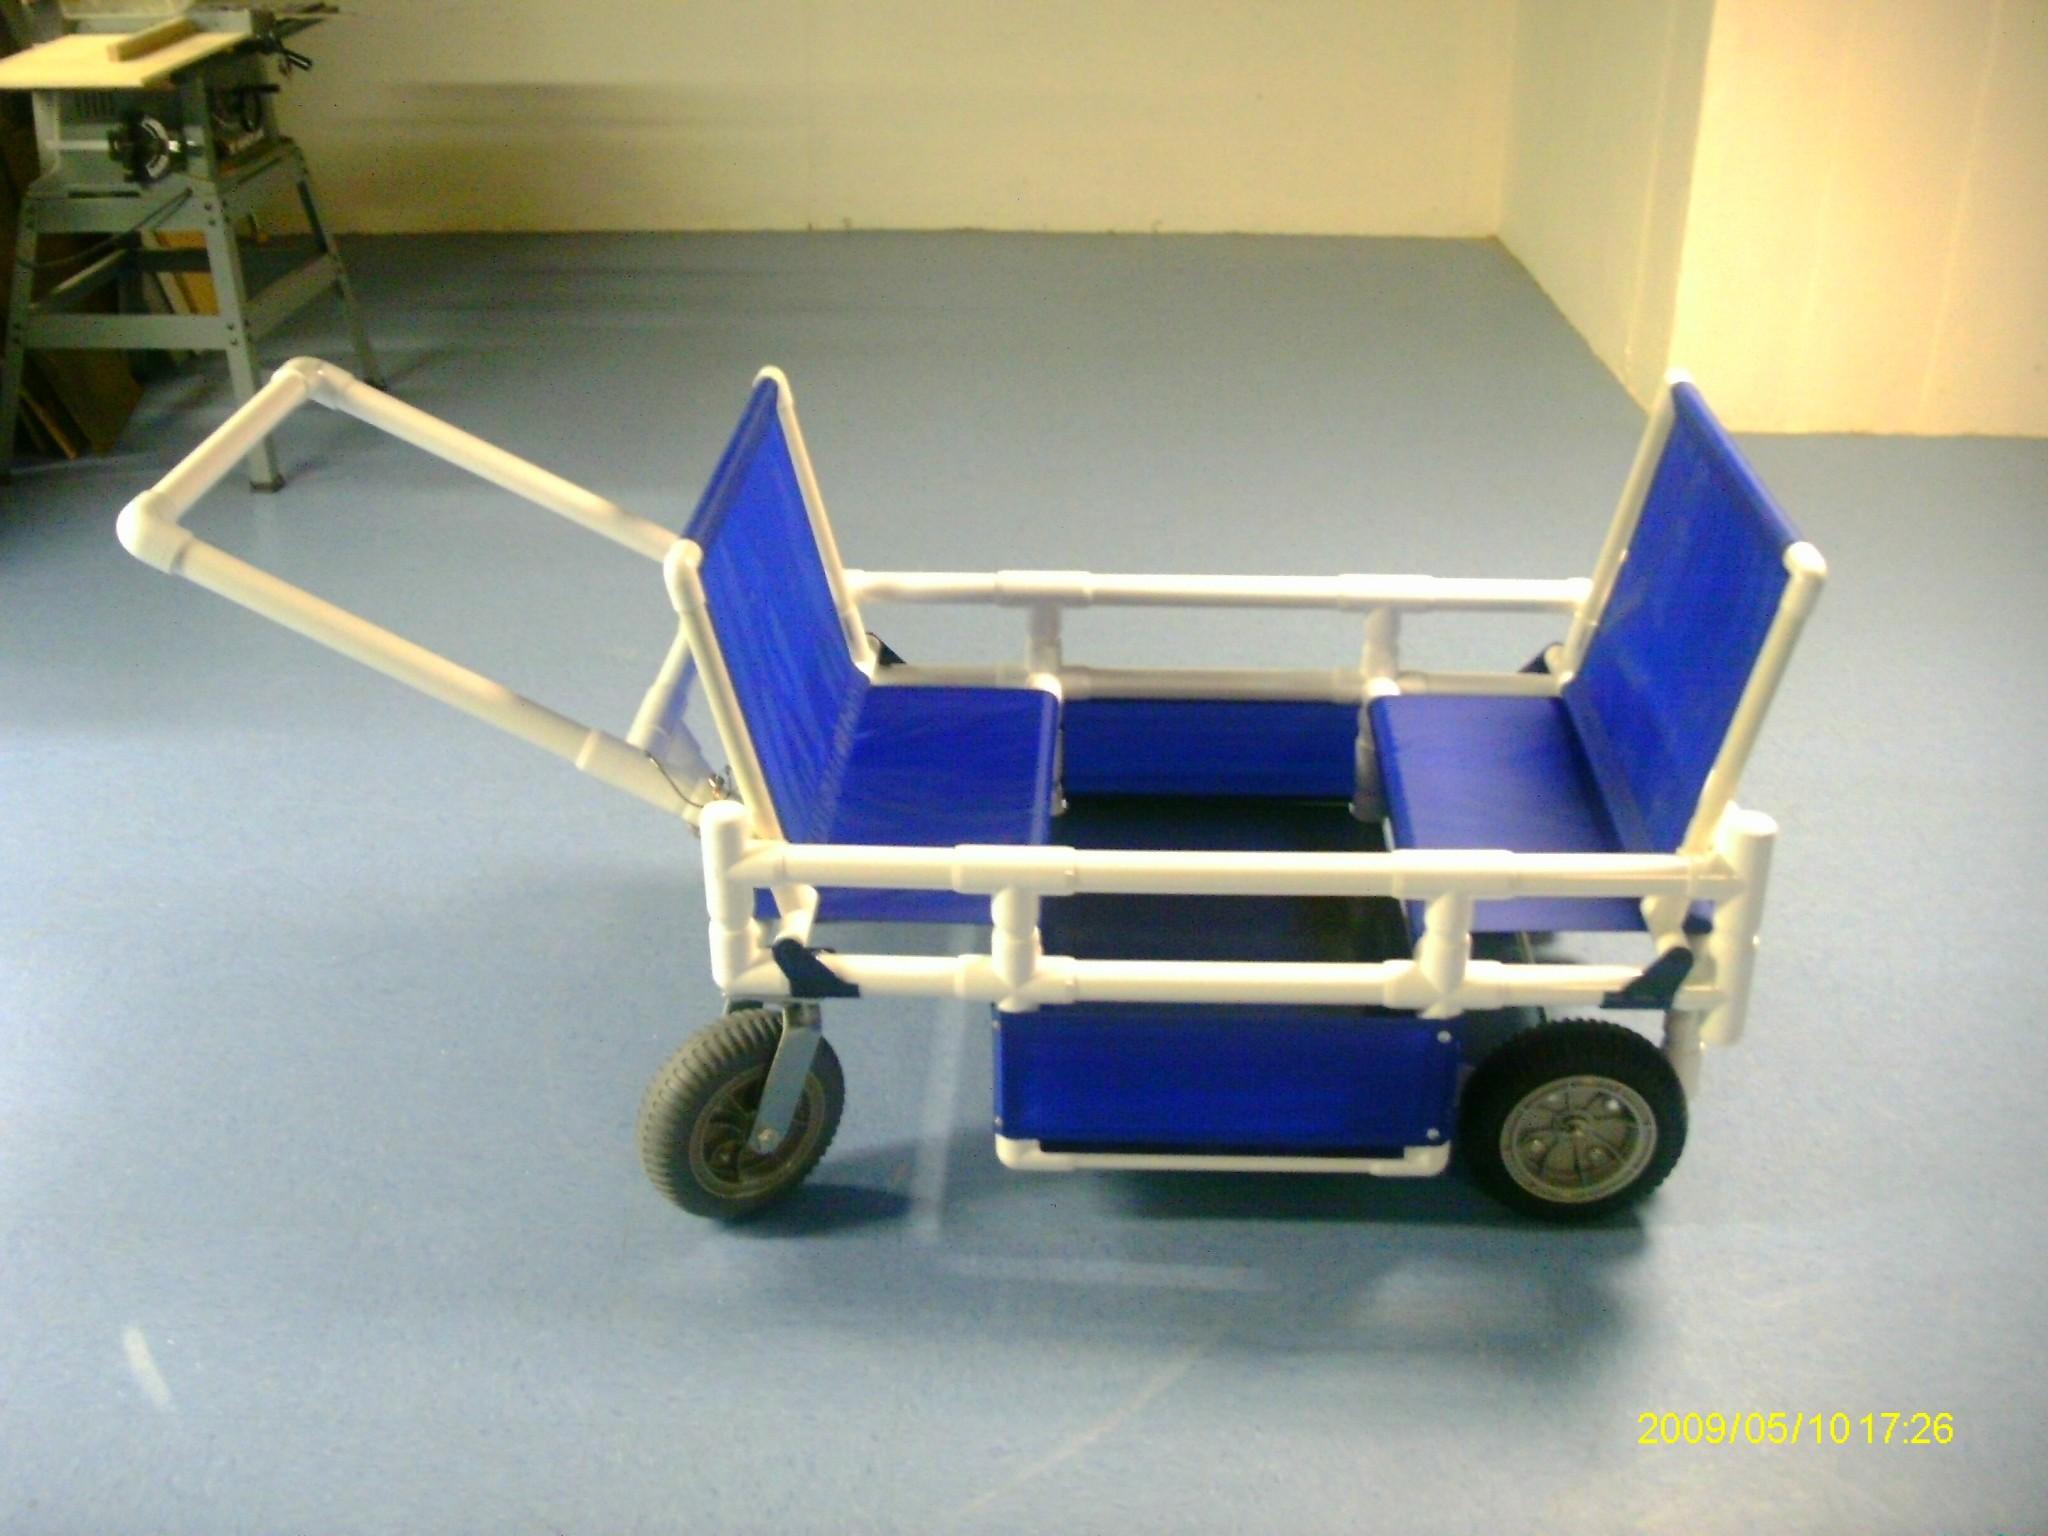 Open modular stroller